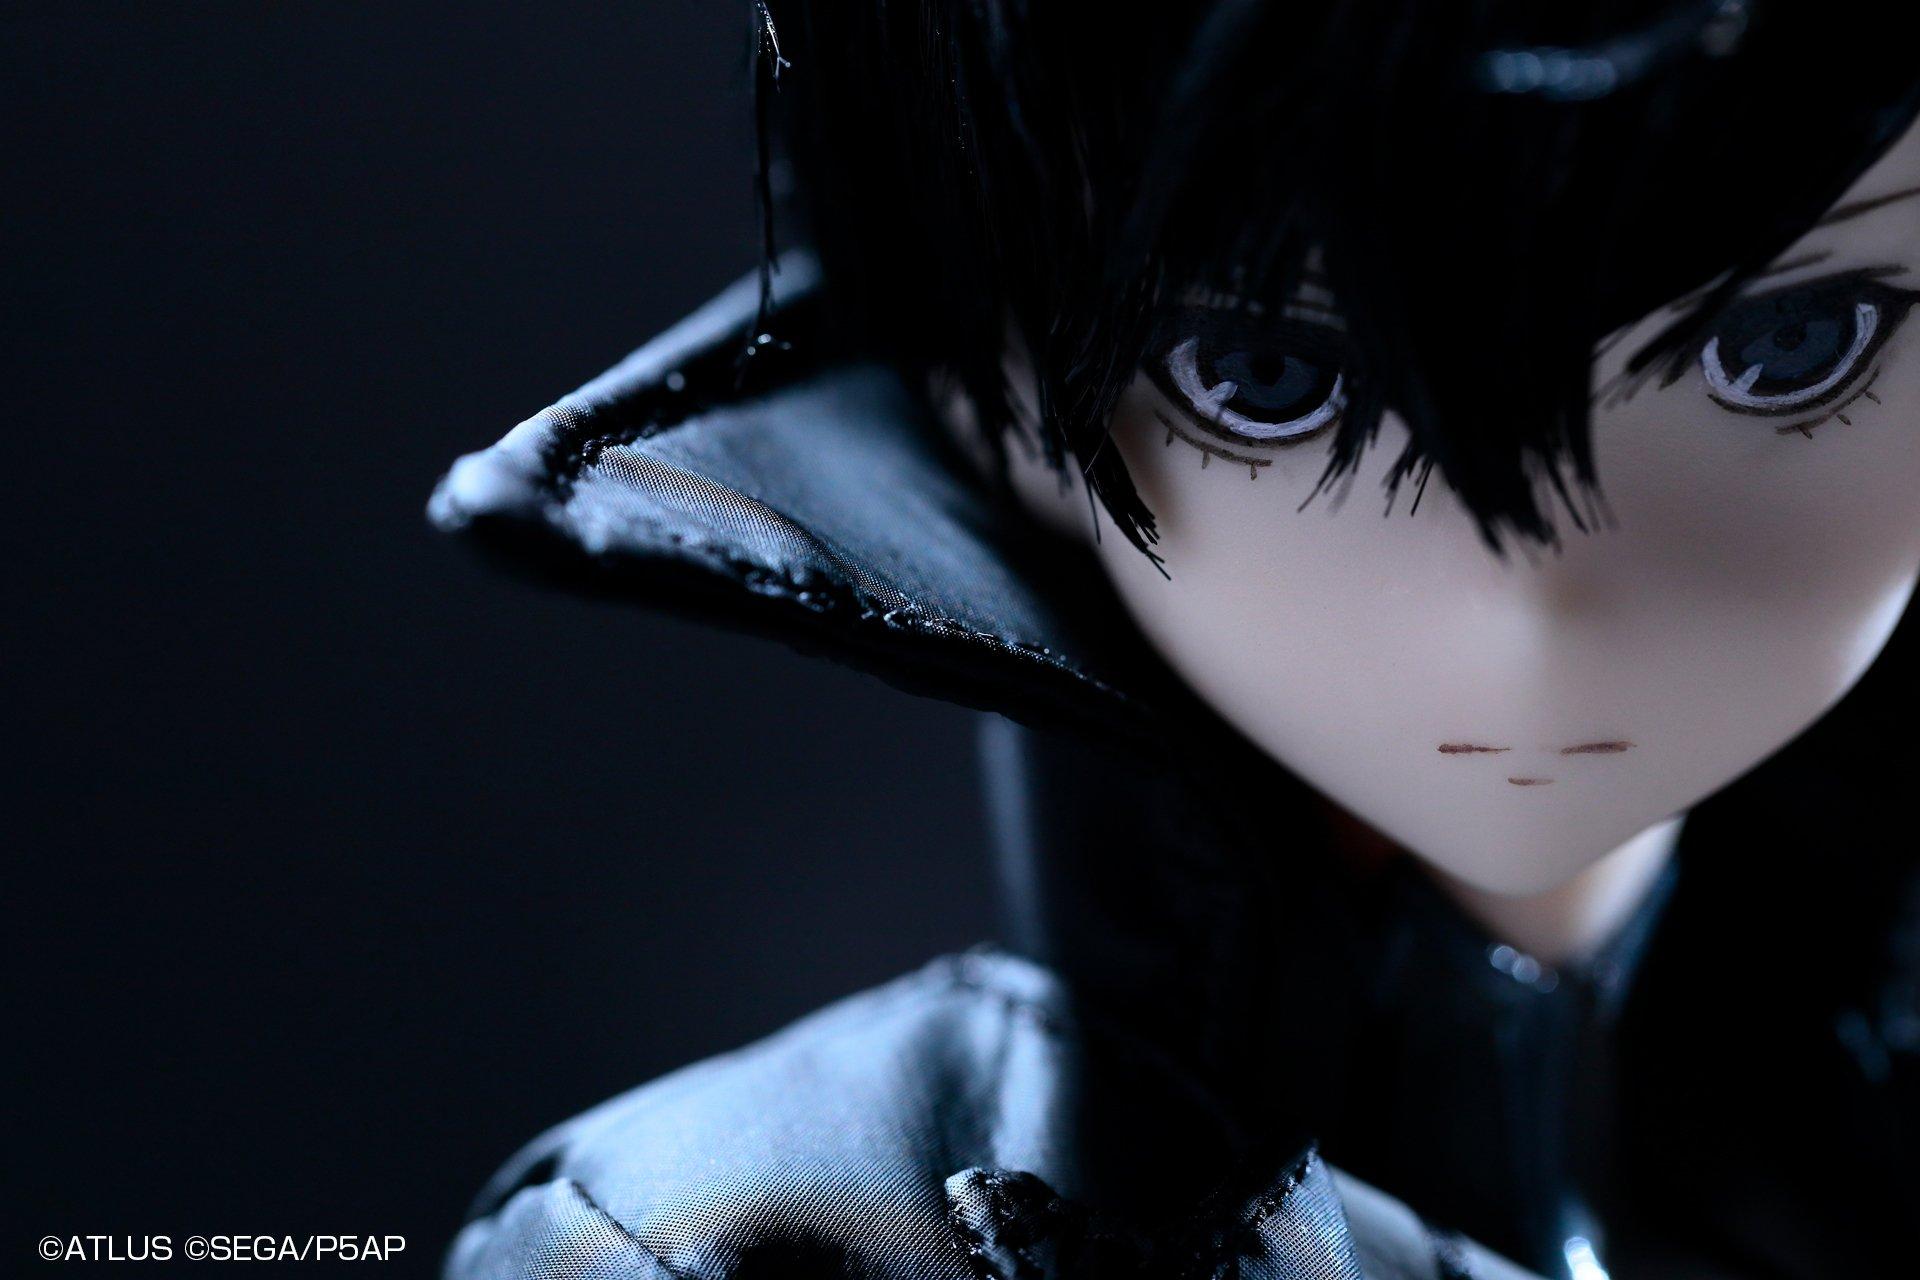 [Pure Neemo] Rei Amamiya - Persona 5 The Animation Img_2044